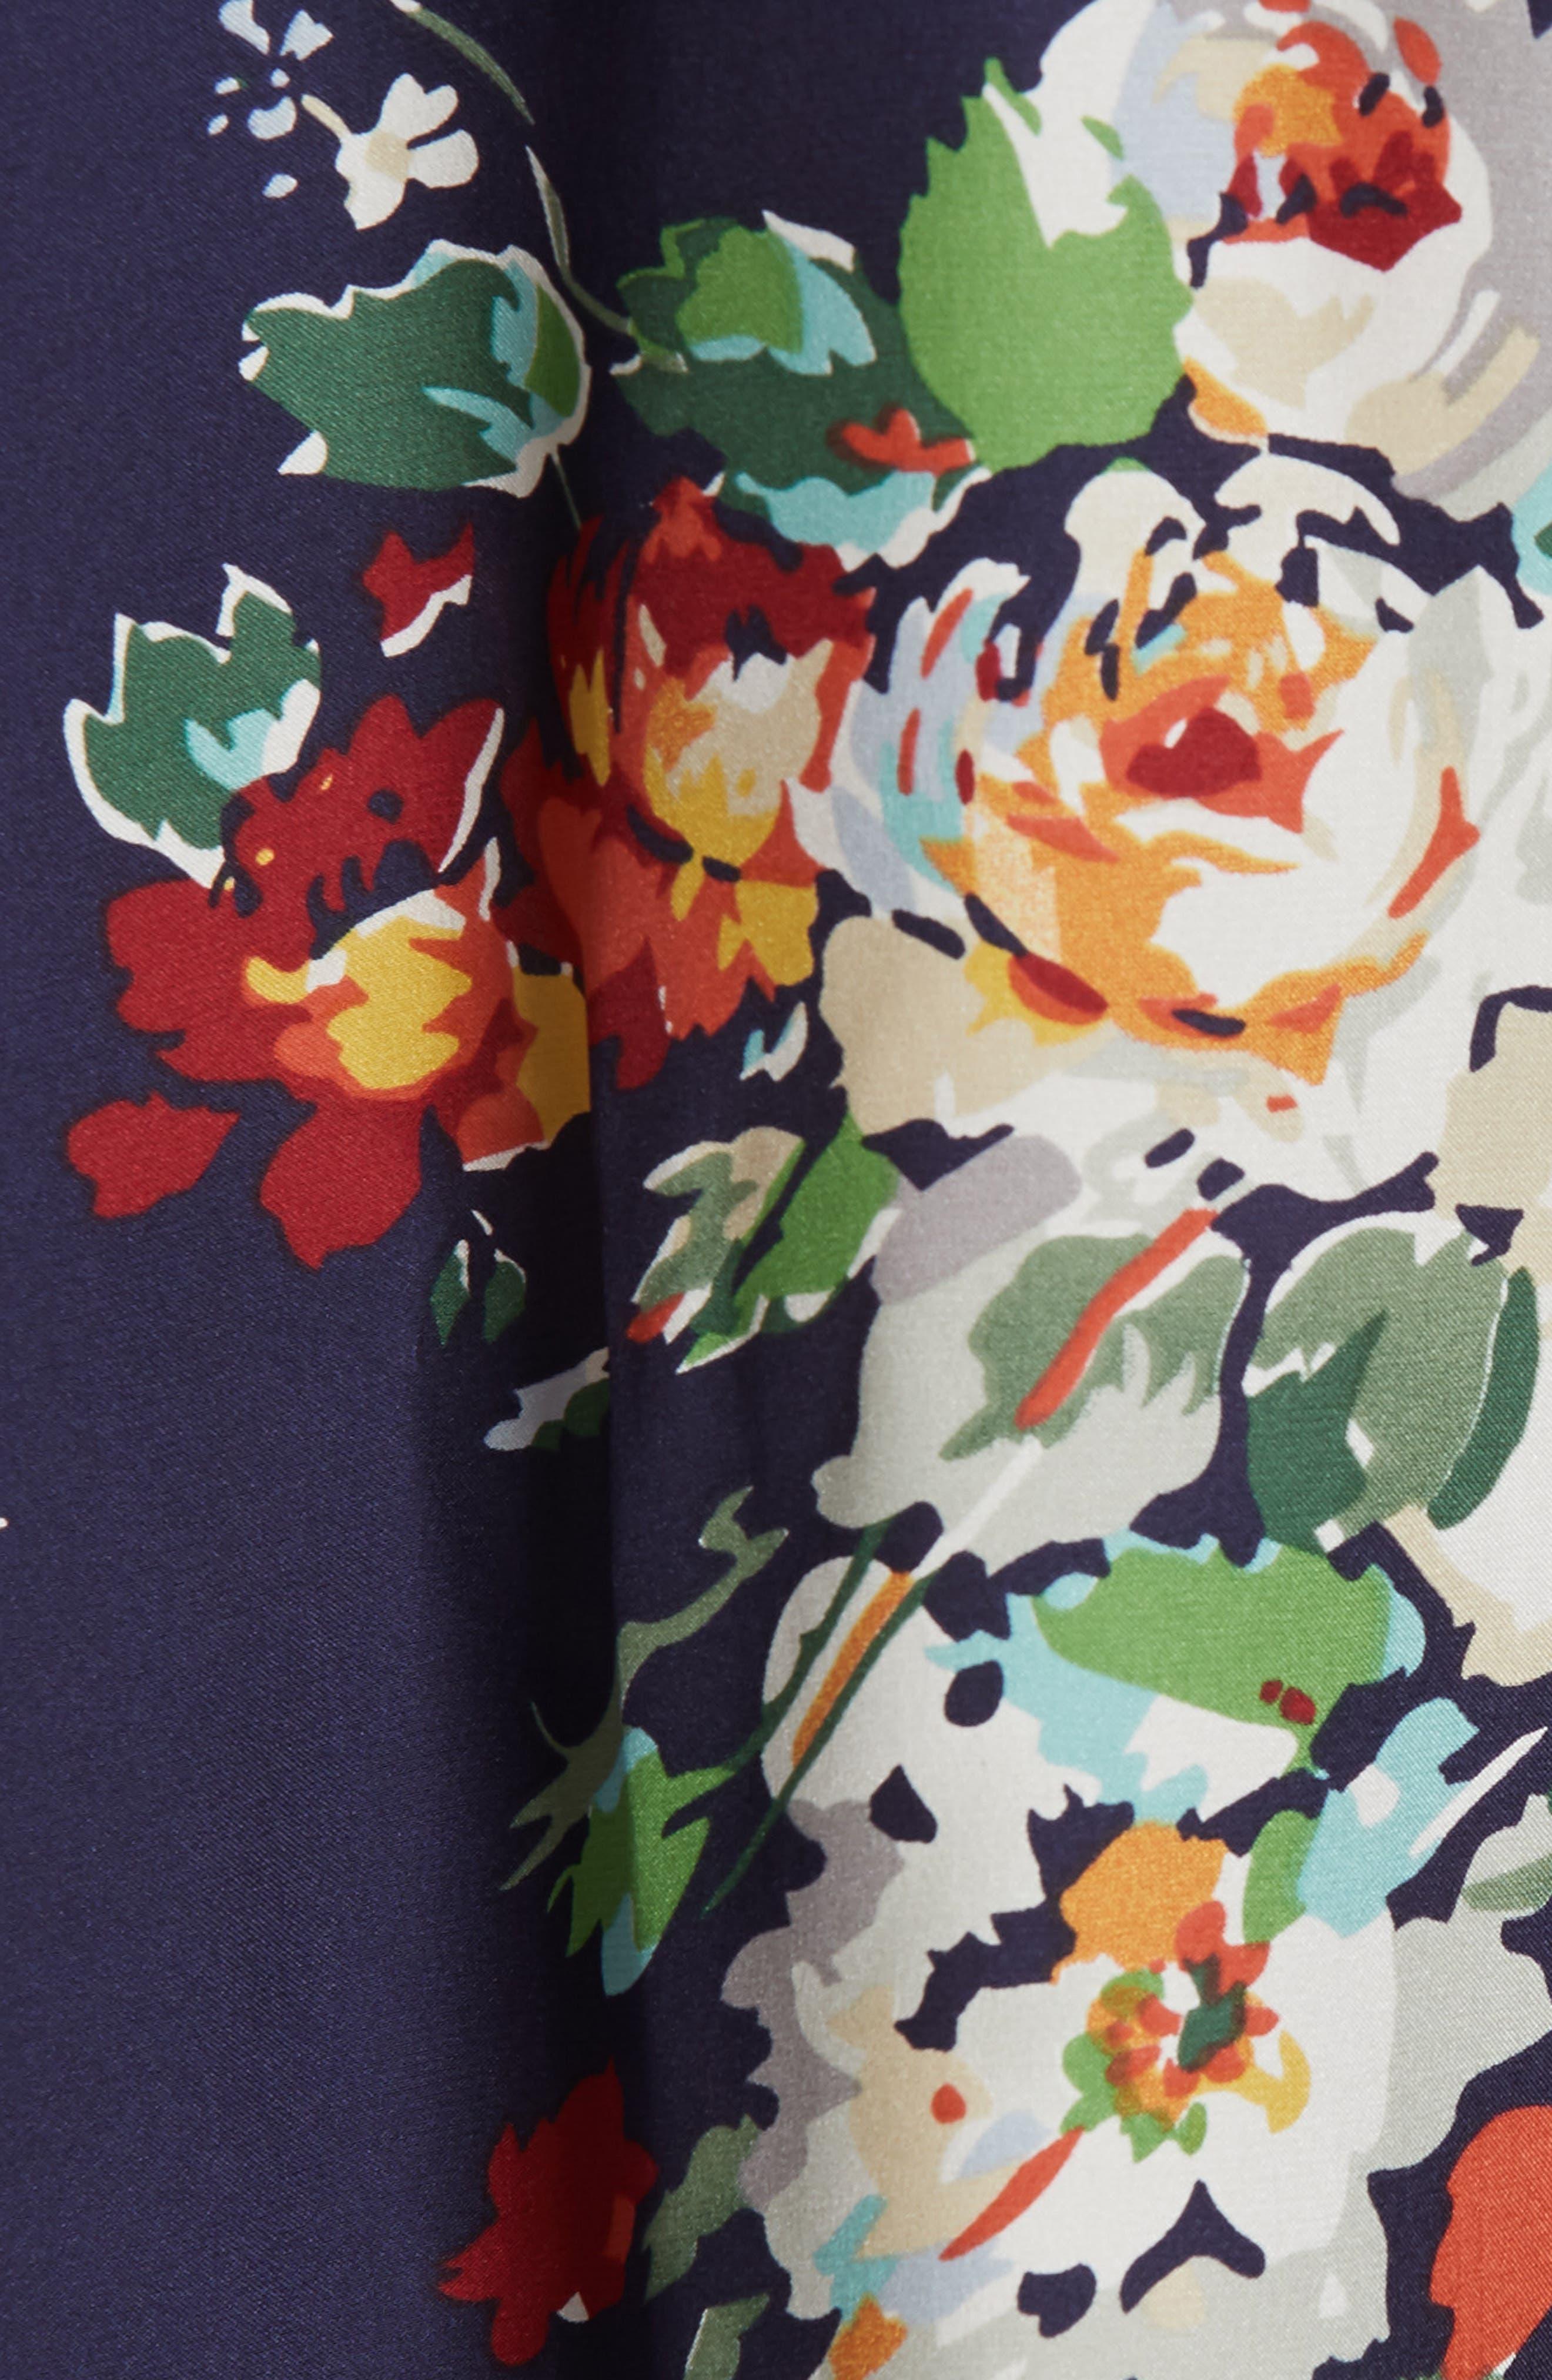 Floral Silk Blouse,                             Alternate thumbnail 5, color,                             NIGHTFALL FLORAL PRINT